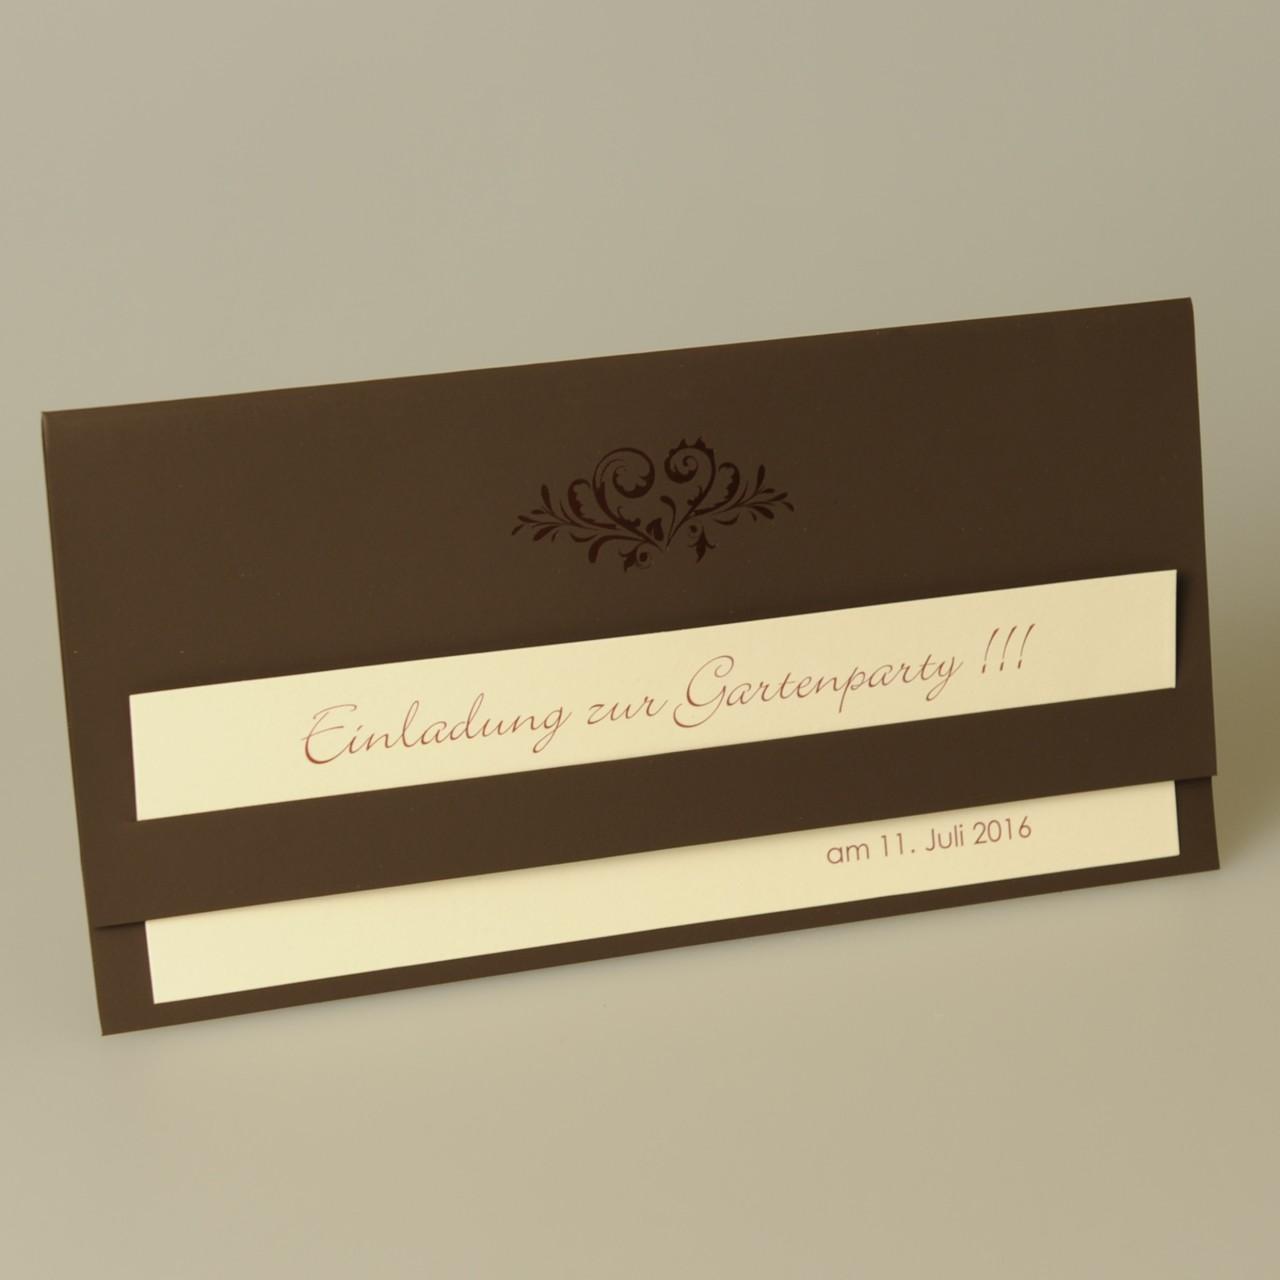 Einladungskarte - A 1986